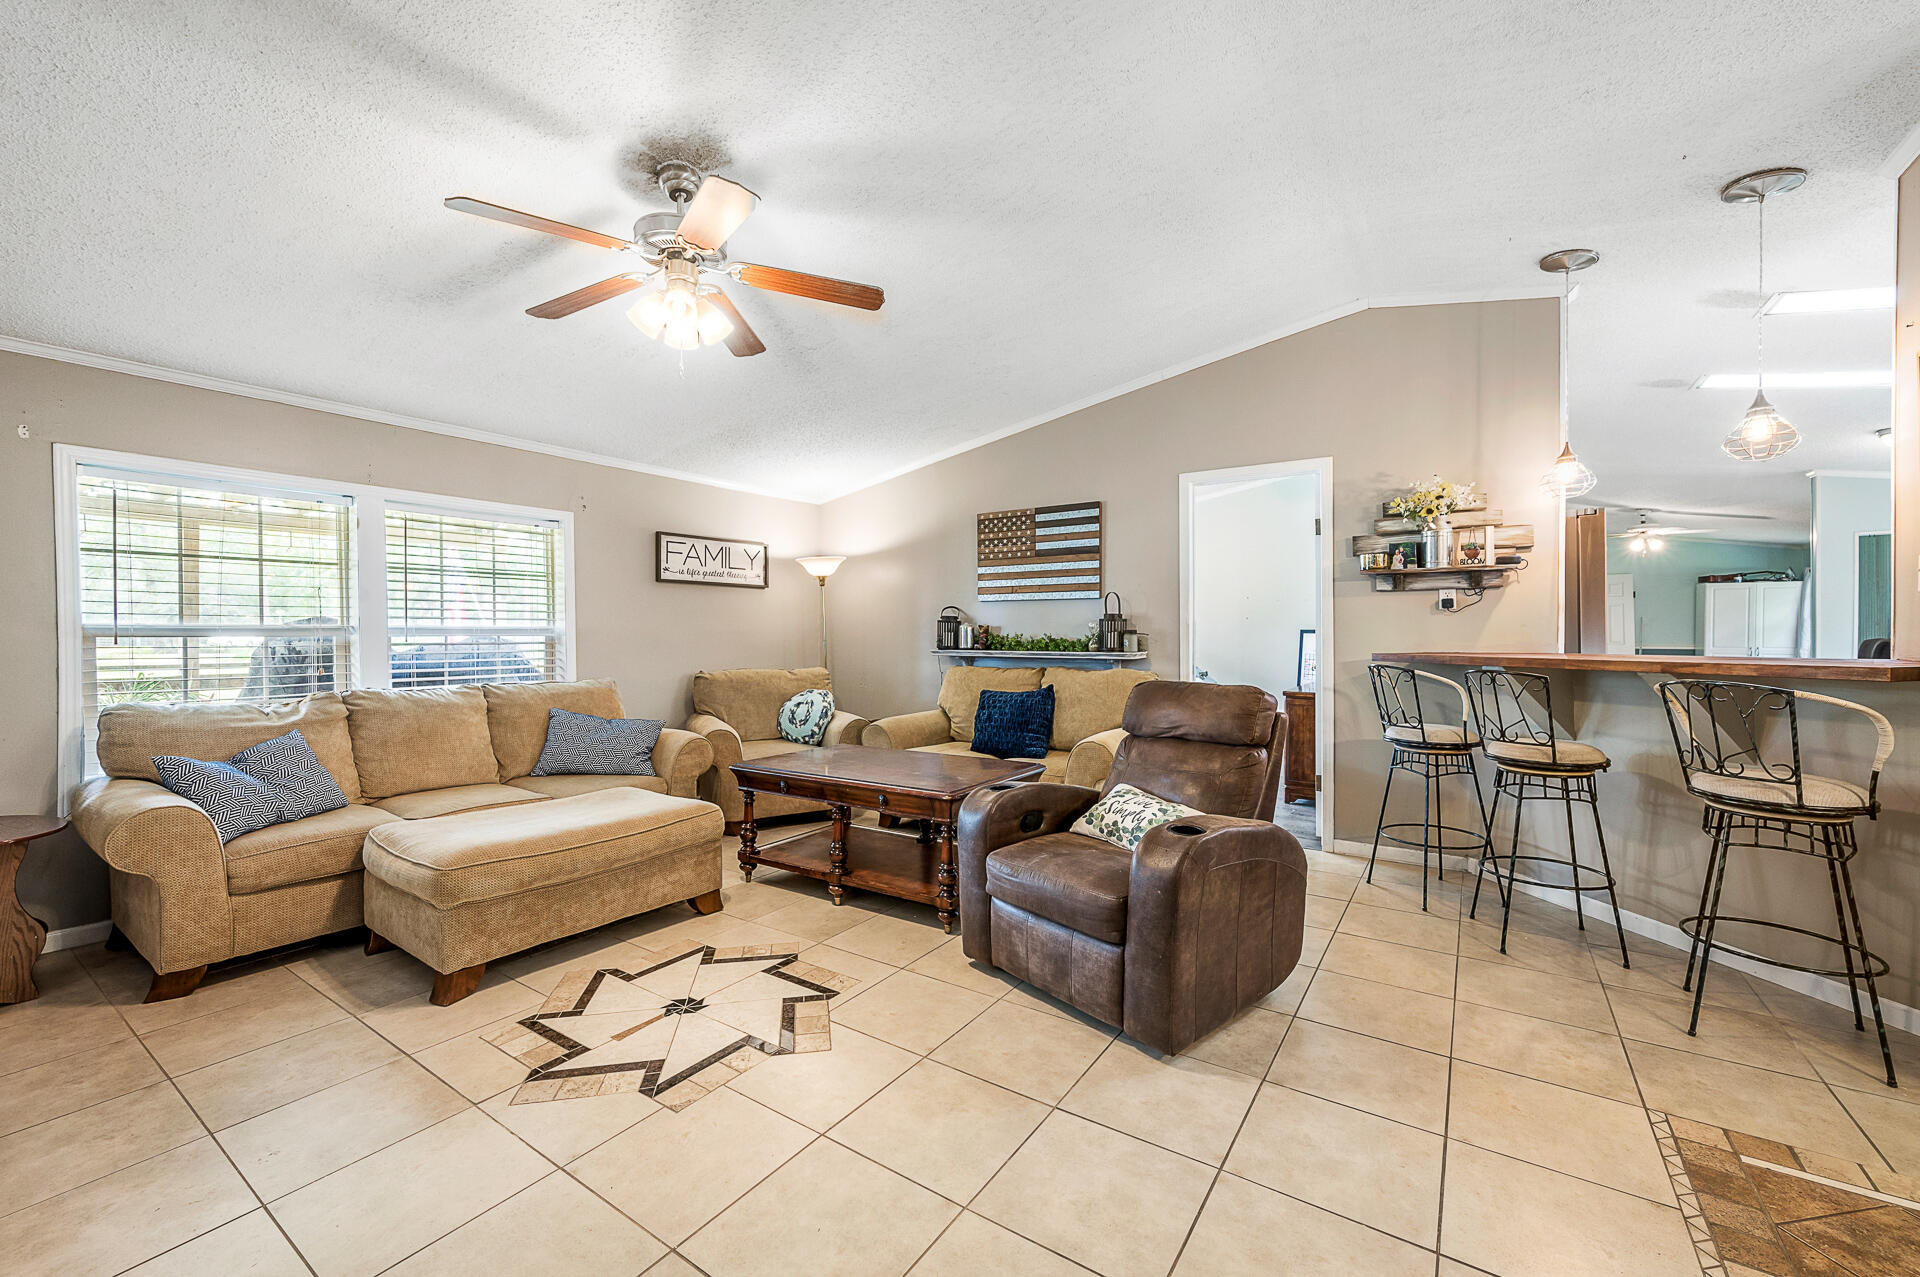 Clemson Terrace Homes For Sale - 250 Medina, Summerville, SC - 2